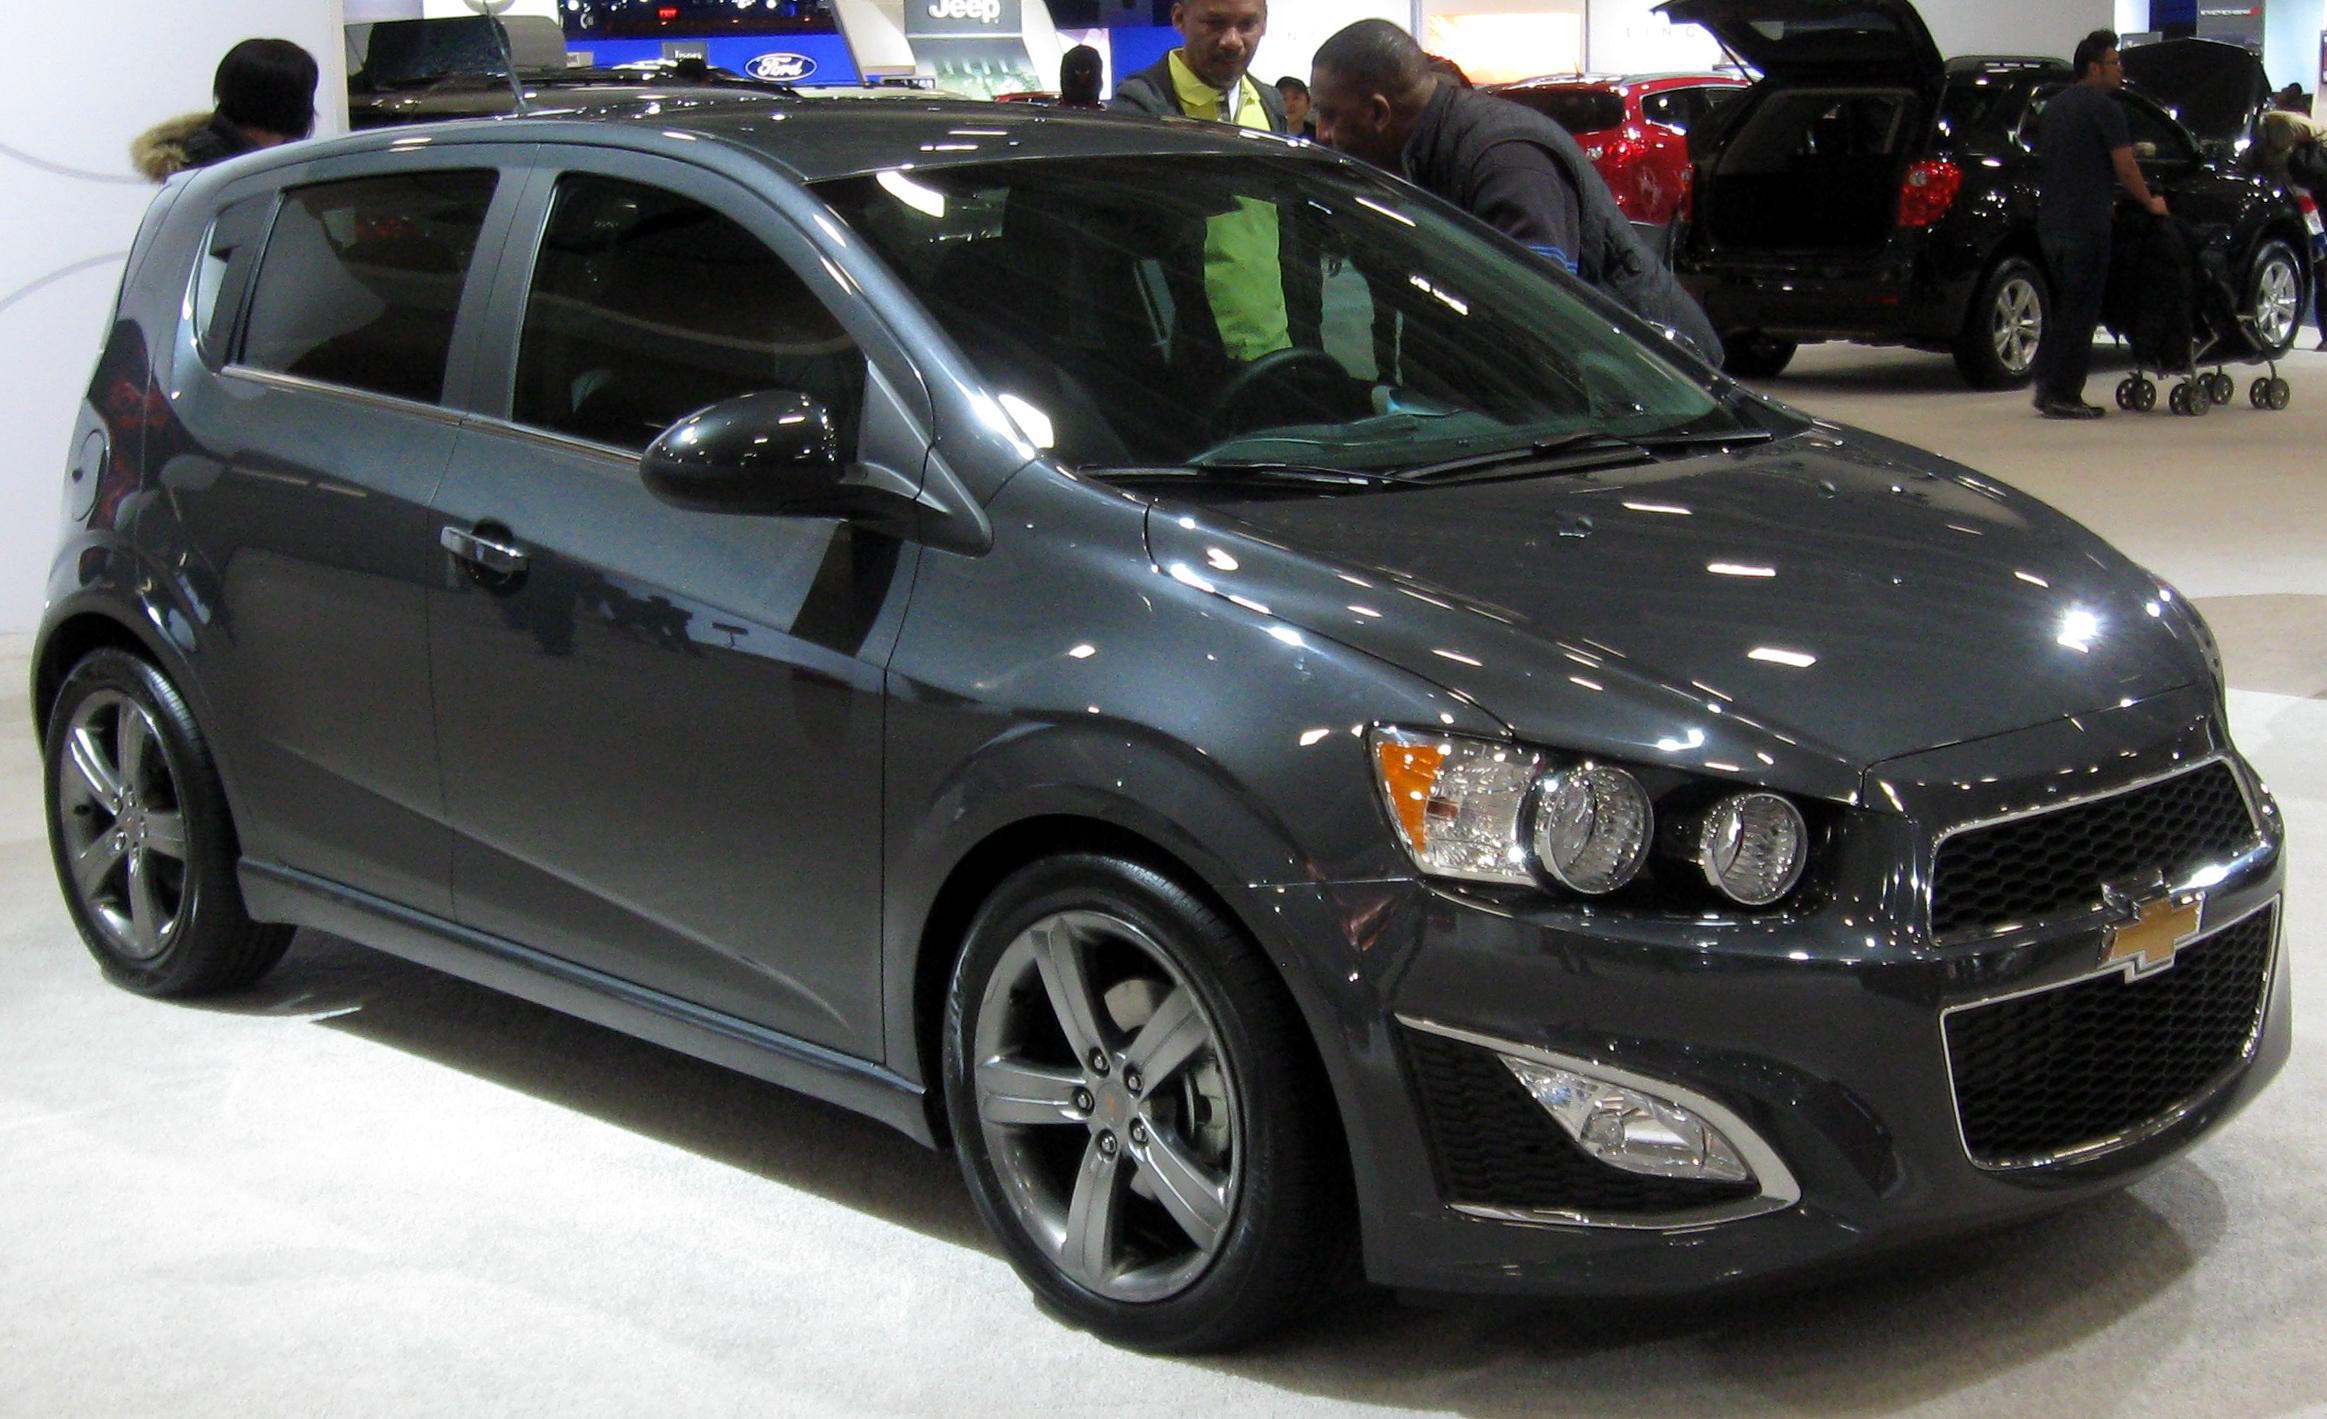 Kelebihan Sonic Chevrolet 2013 Tangguh